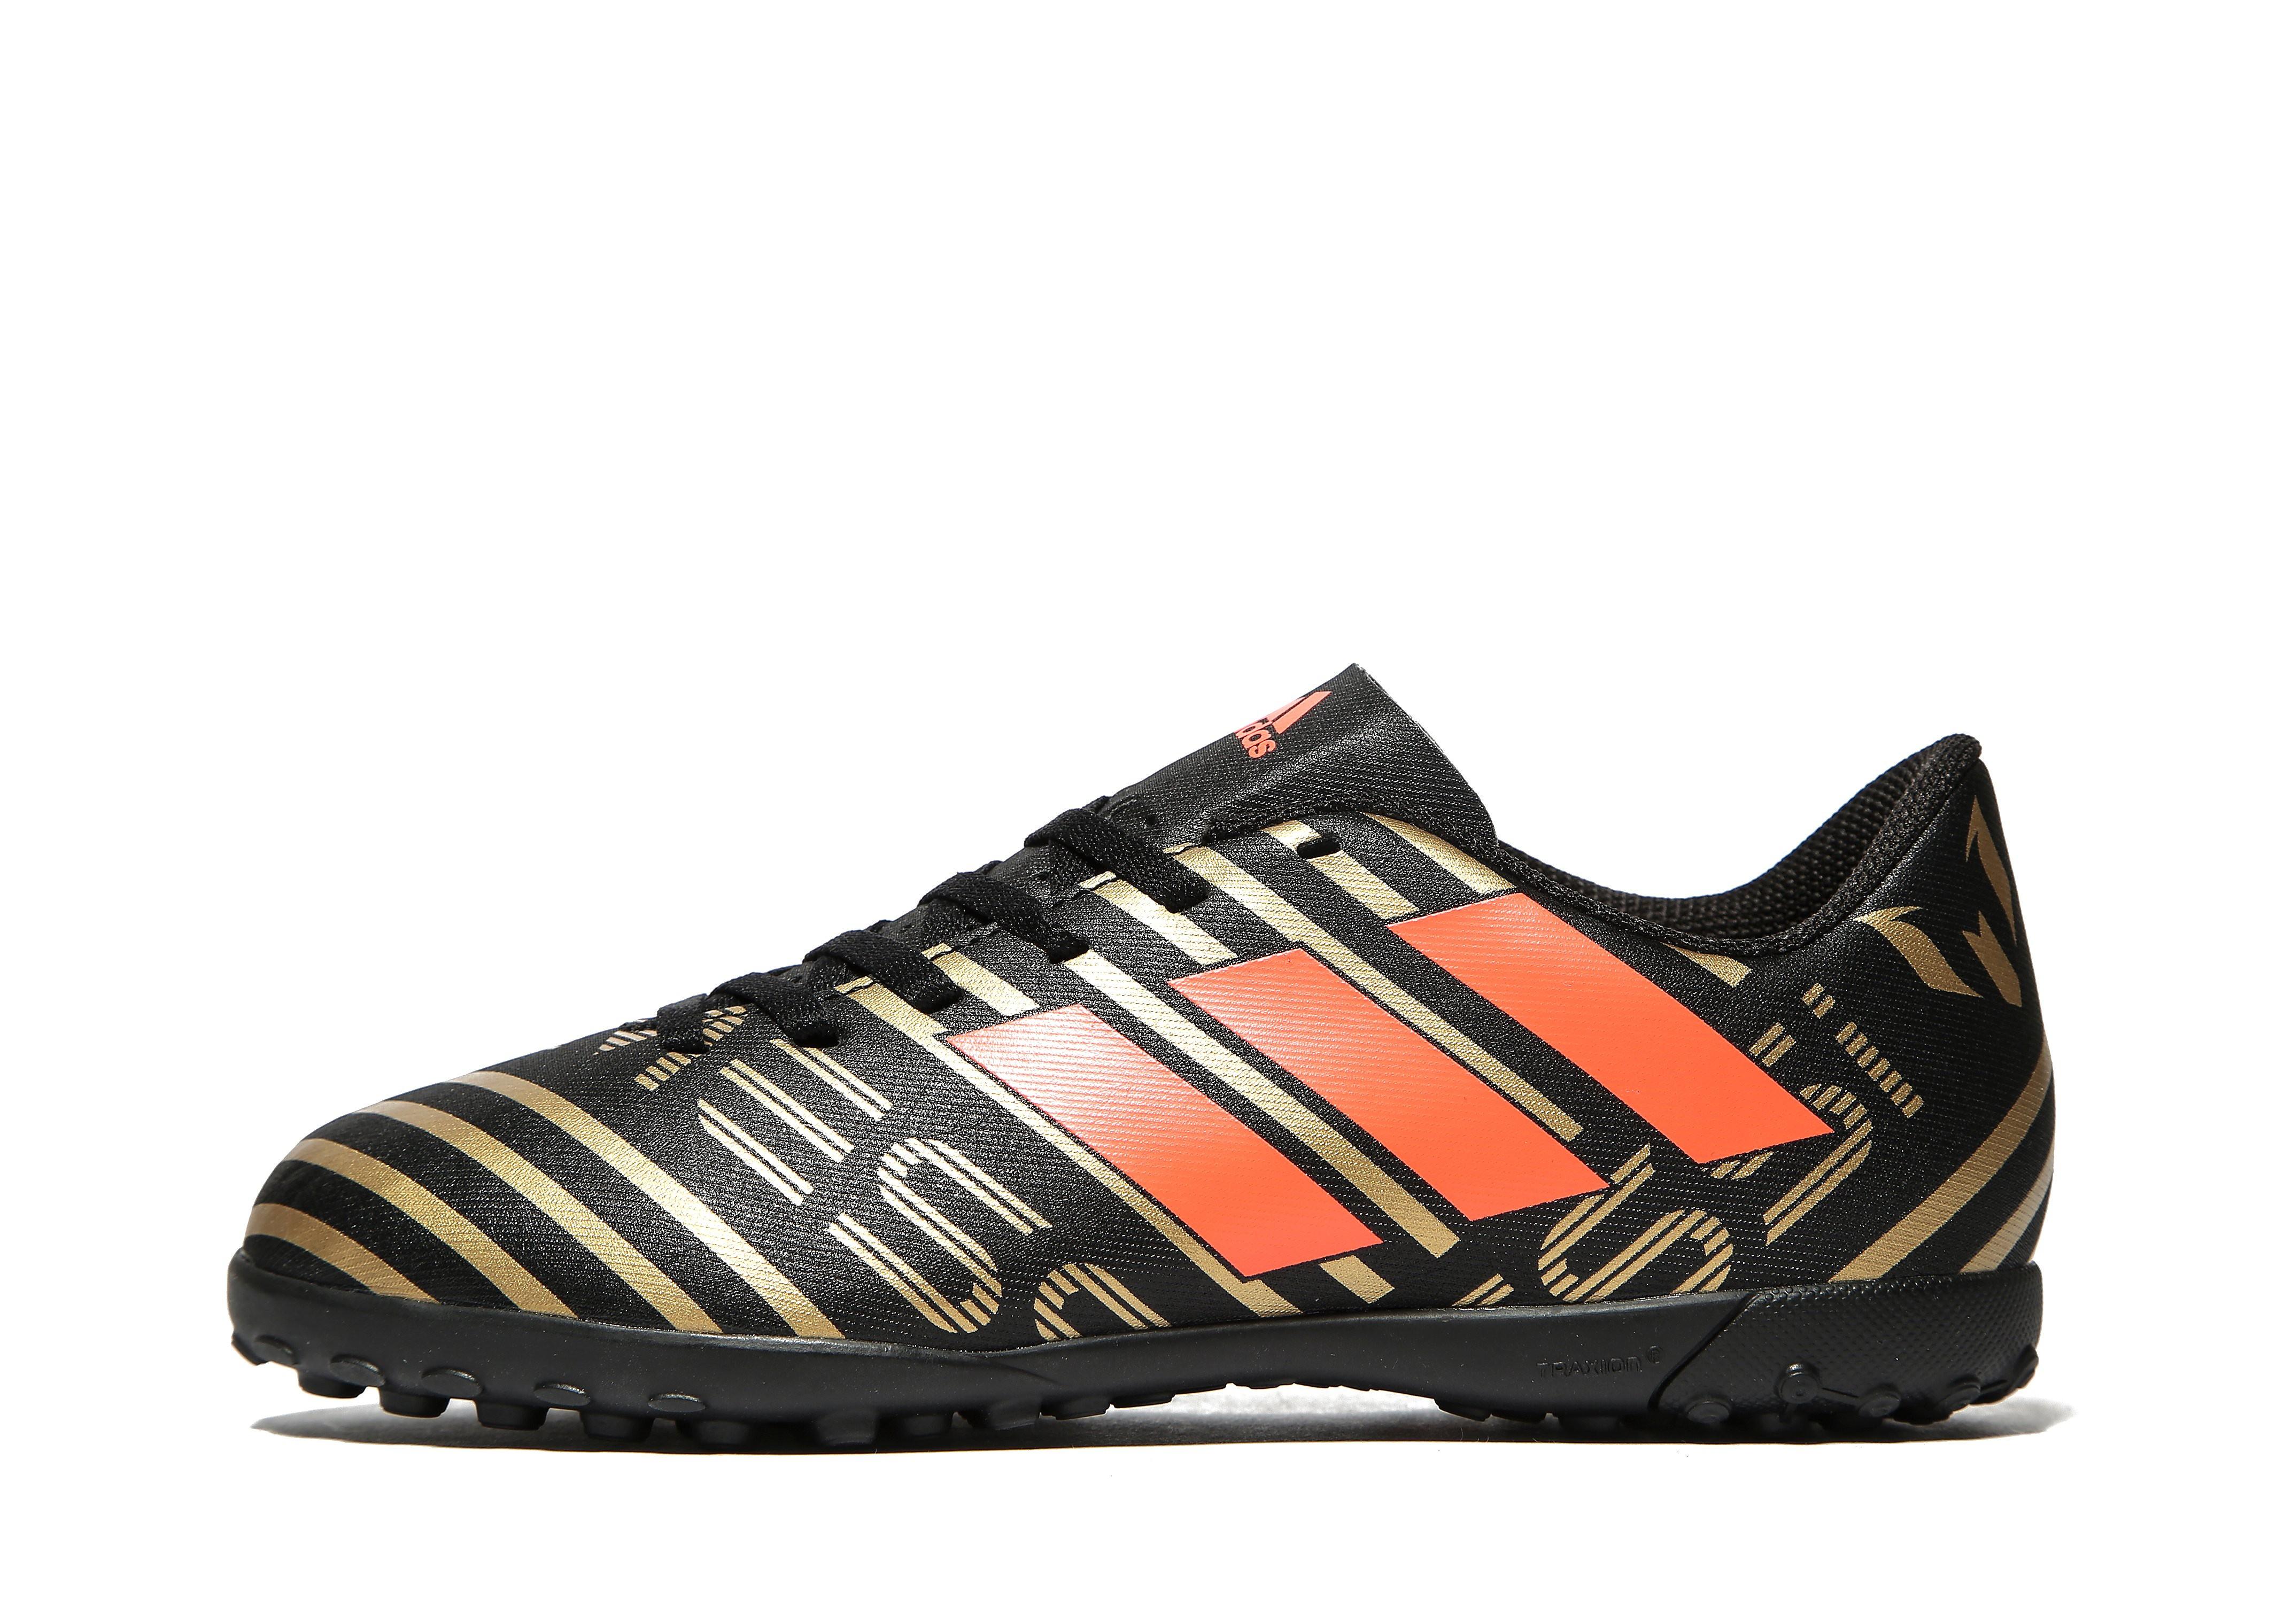 adidas SkyStalker Nemeziz 18.4 TF Messi Children